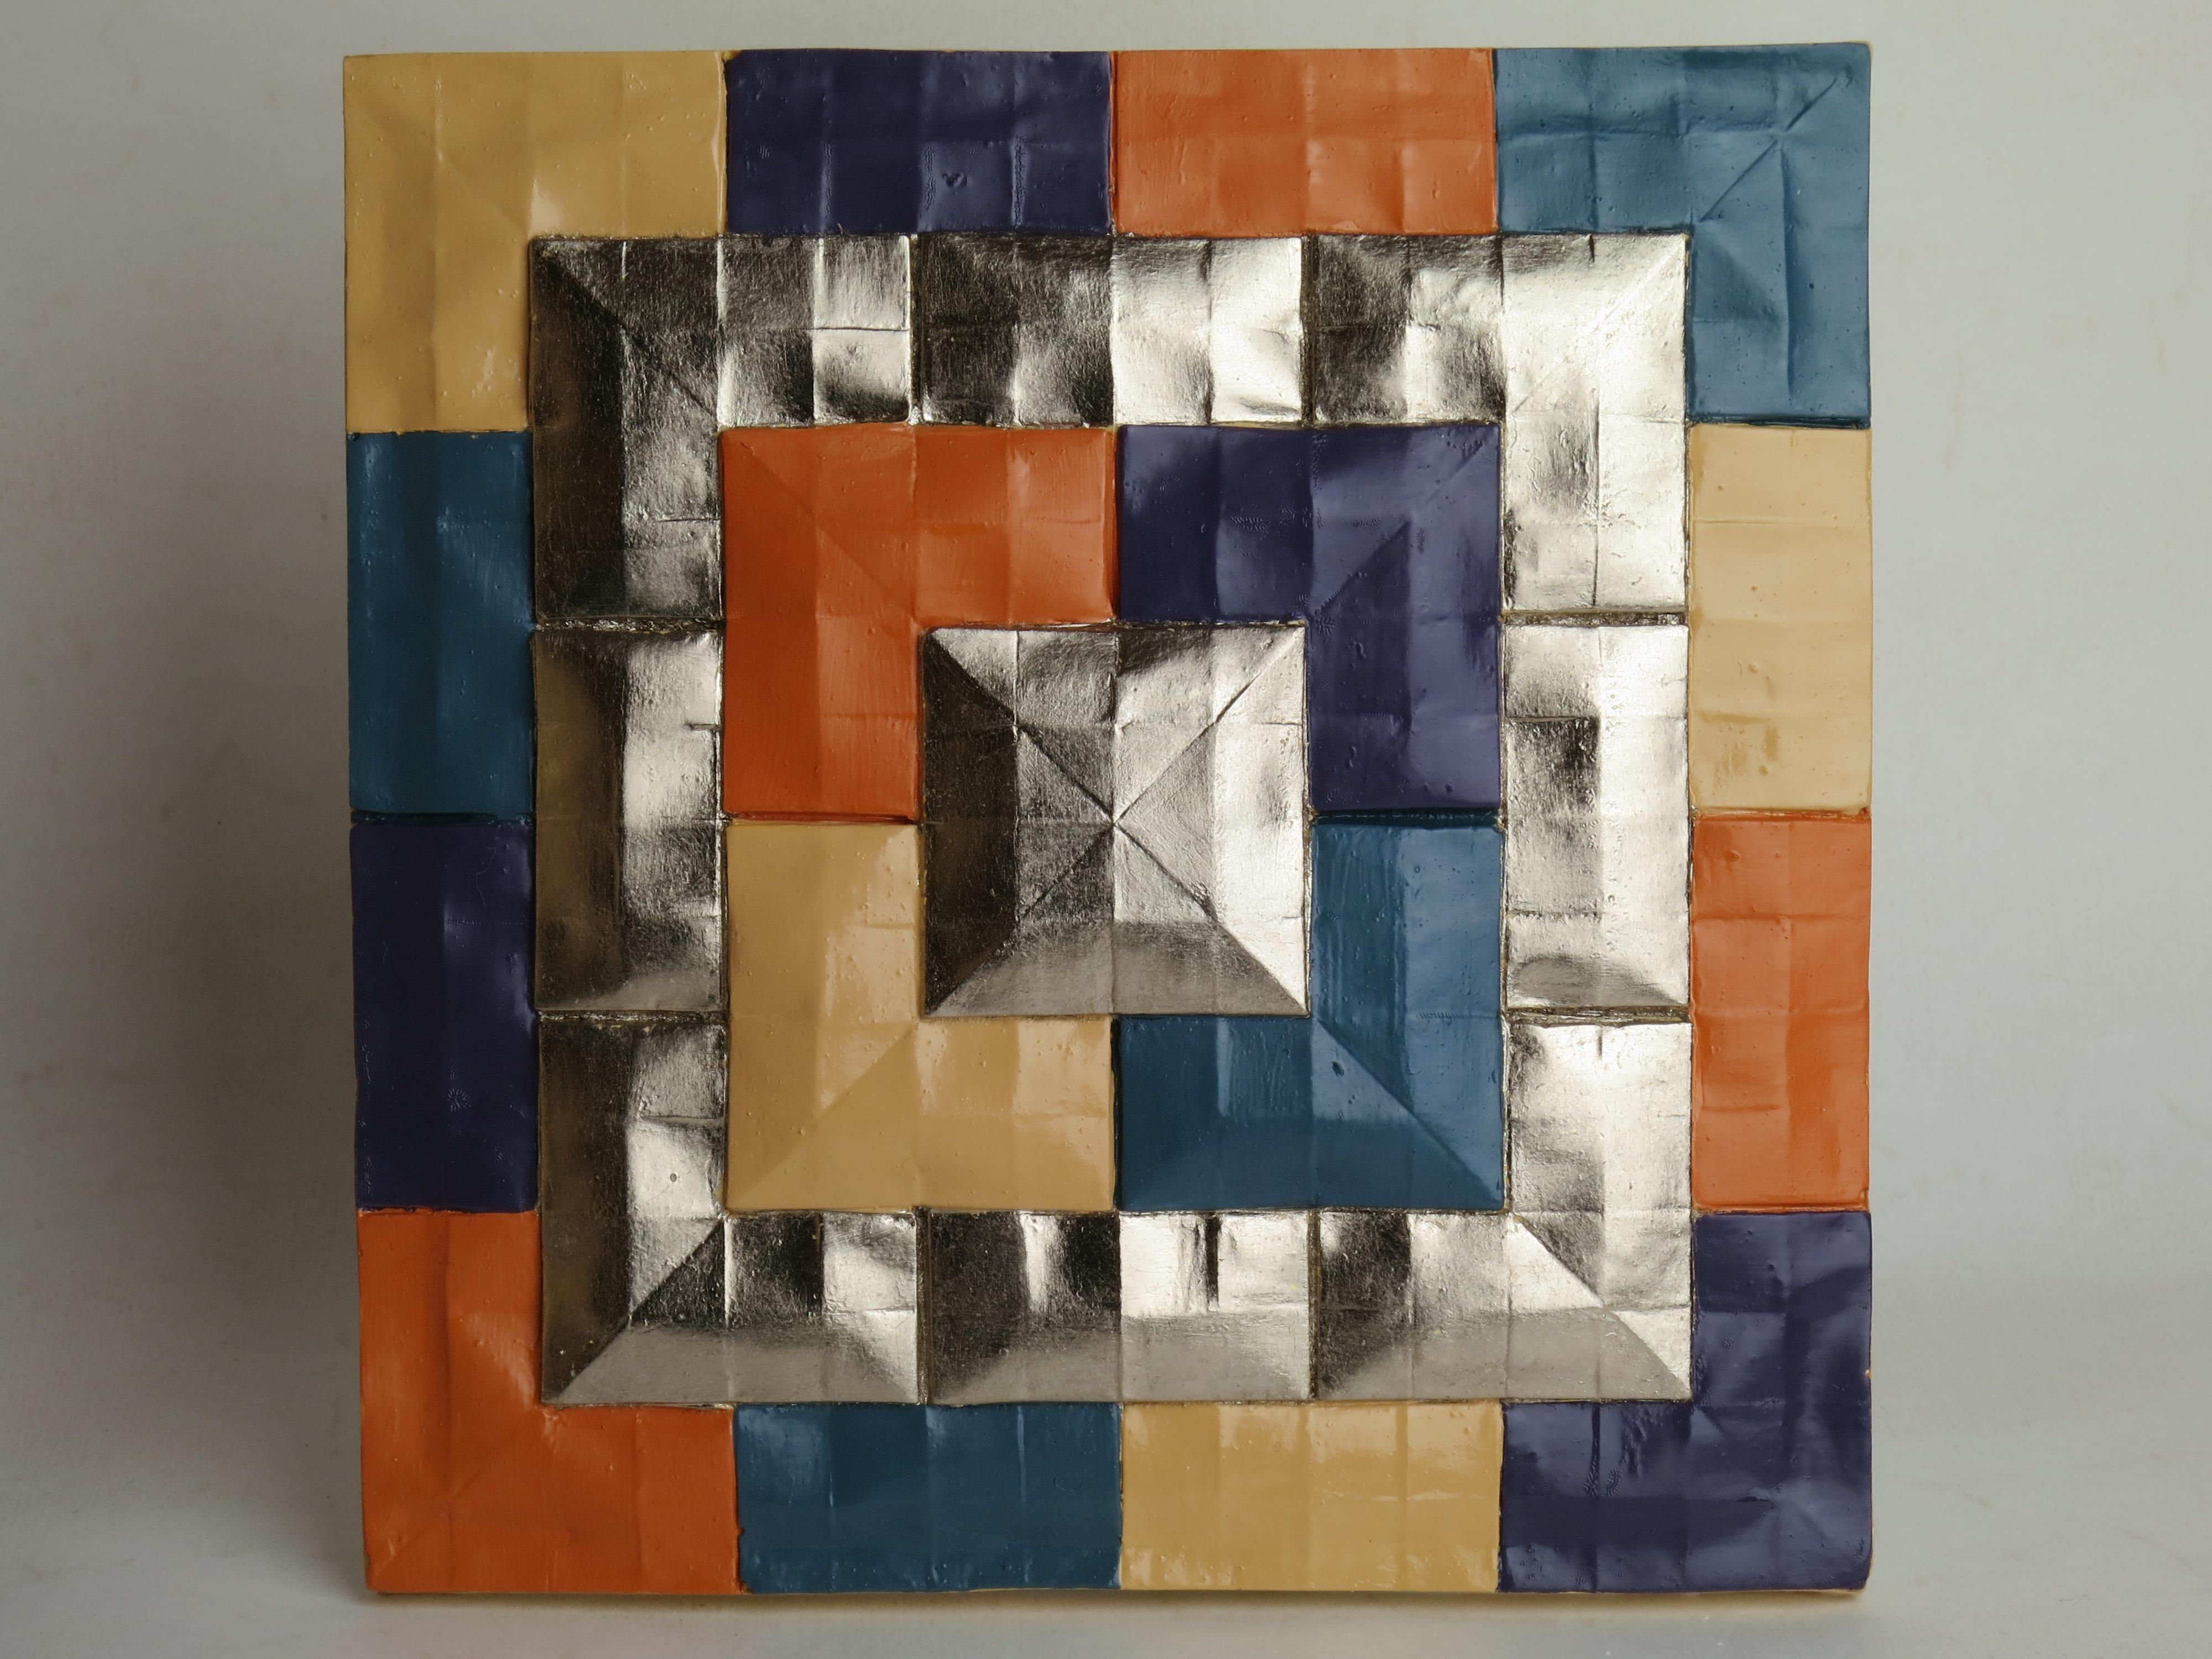 Plaster origami castings